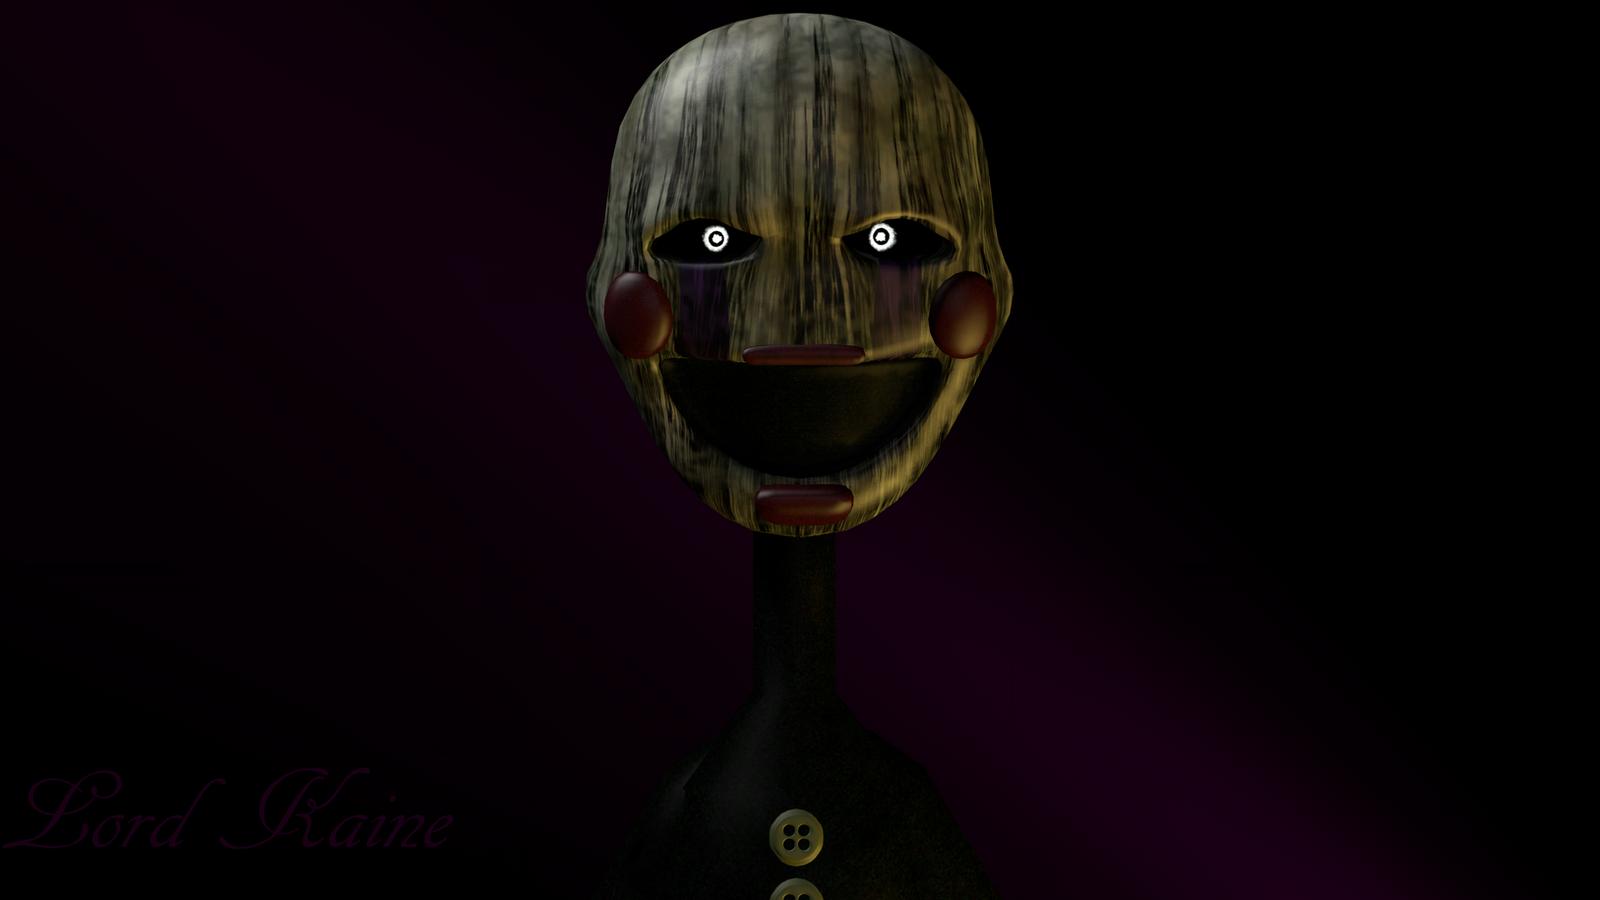 Phantom Puppet Wallpaper by Lord-Kaine on DeviantArt